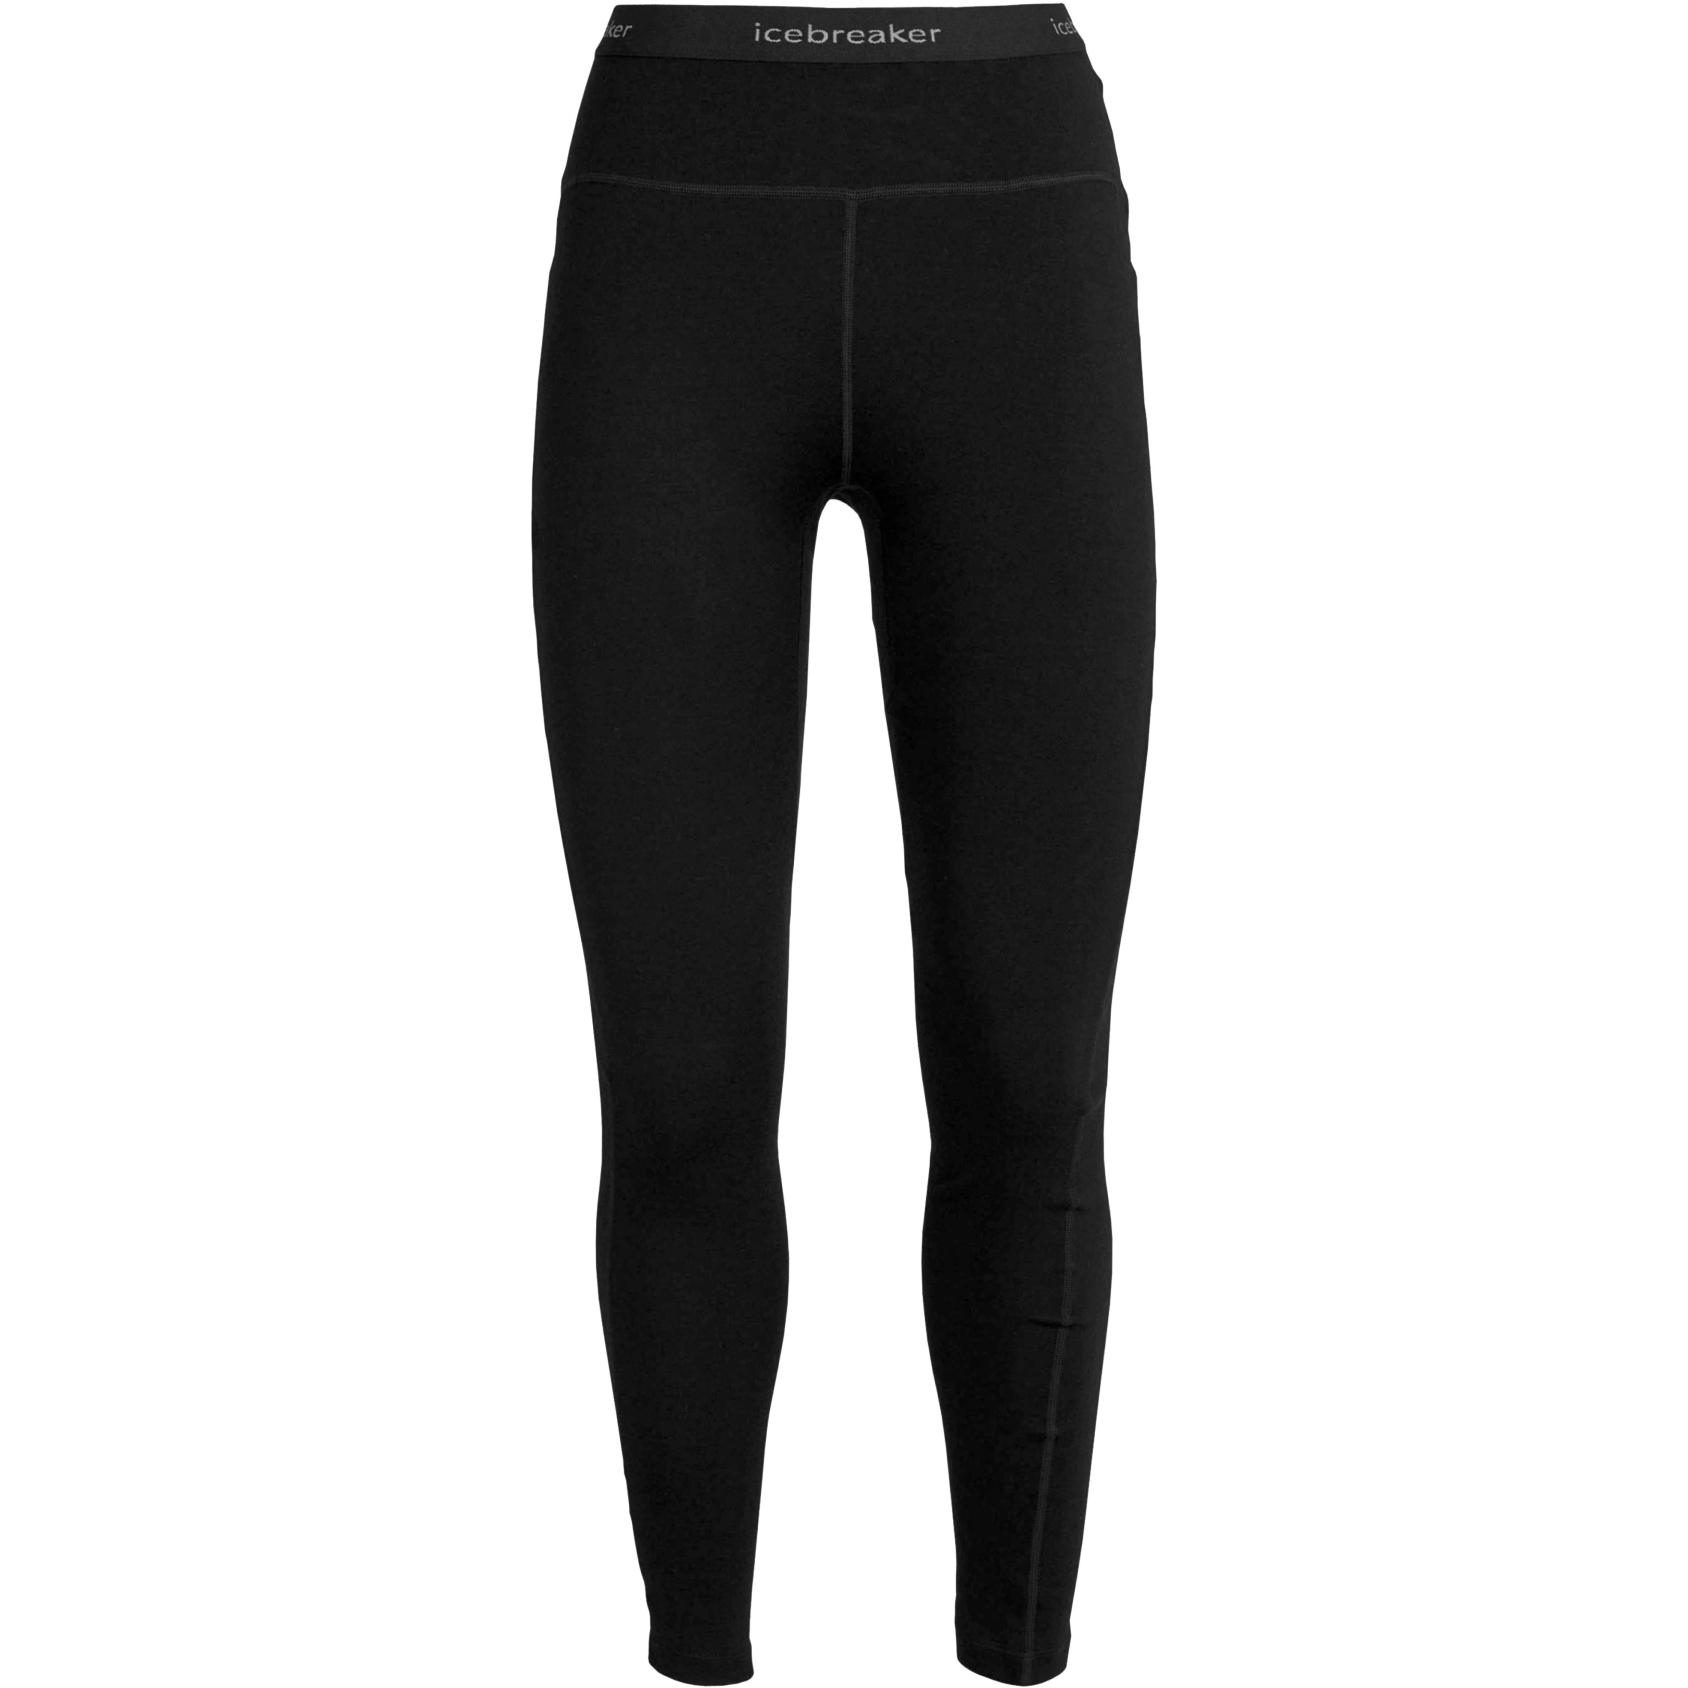 Icebreaker Merino Damen Leggings - Black